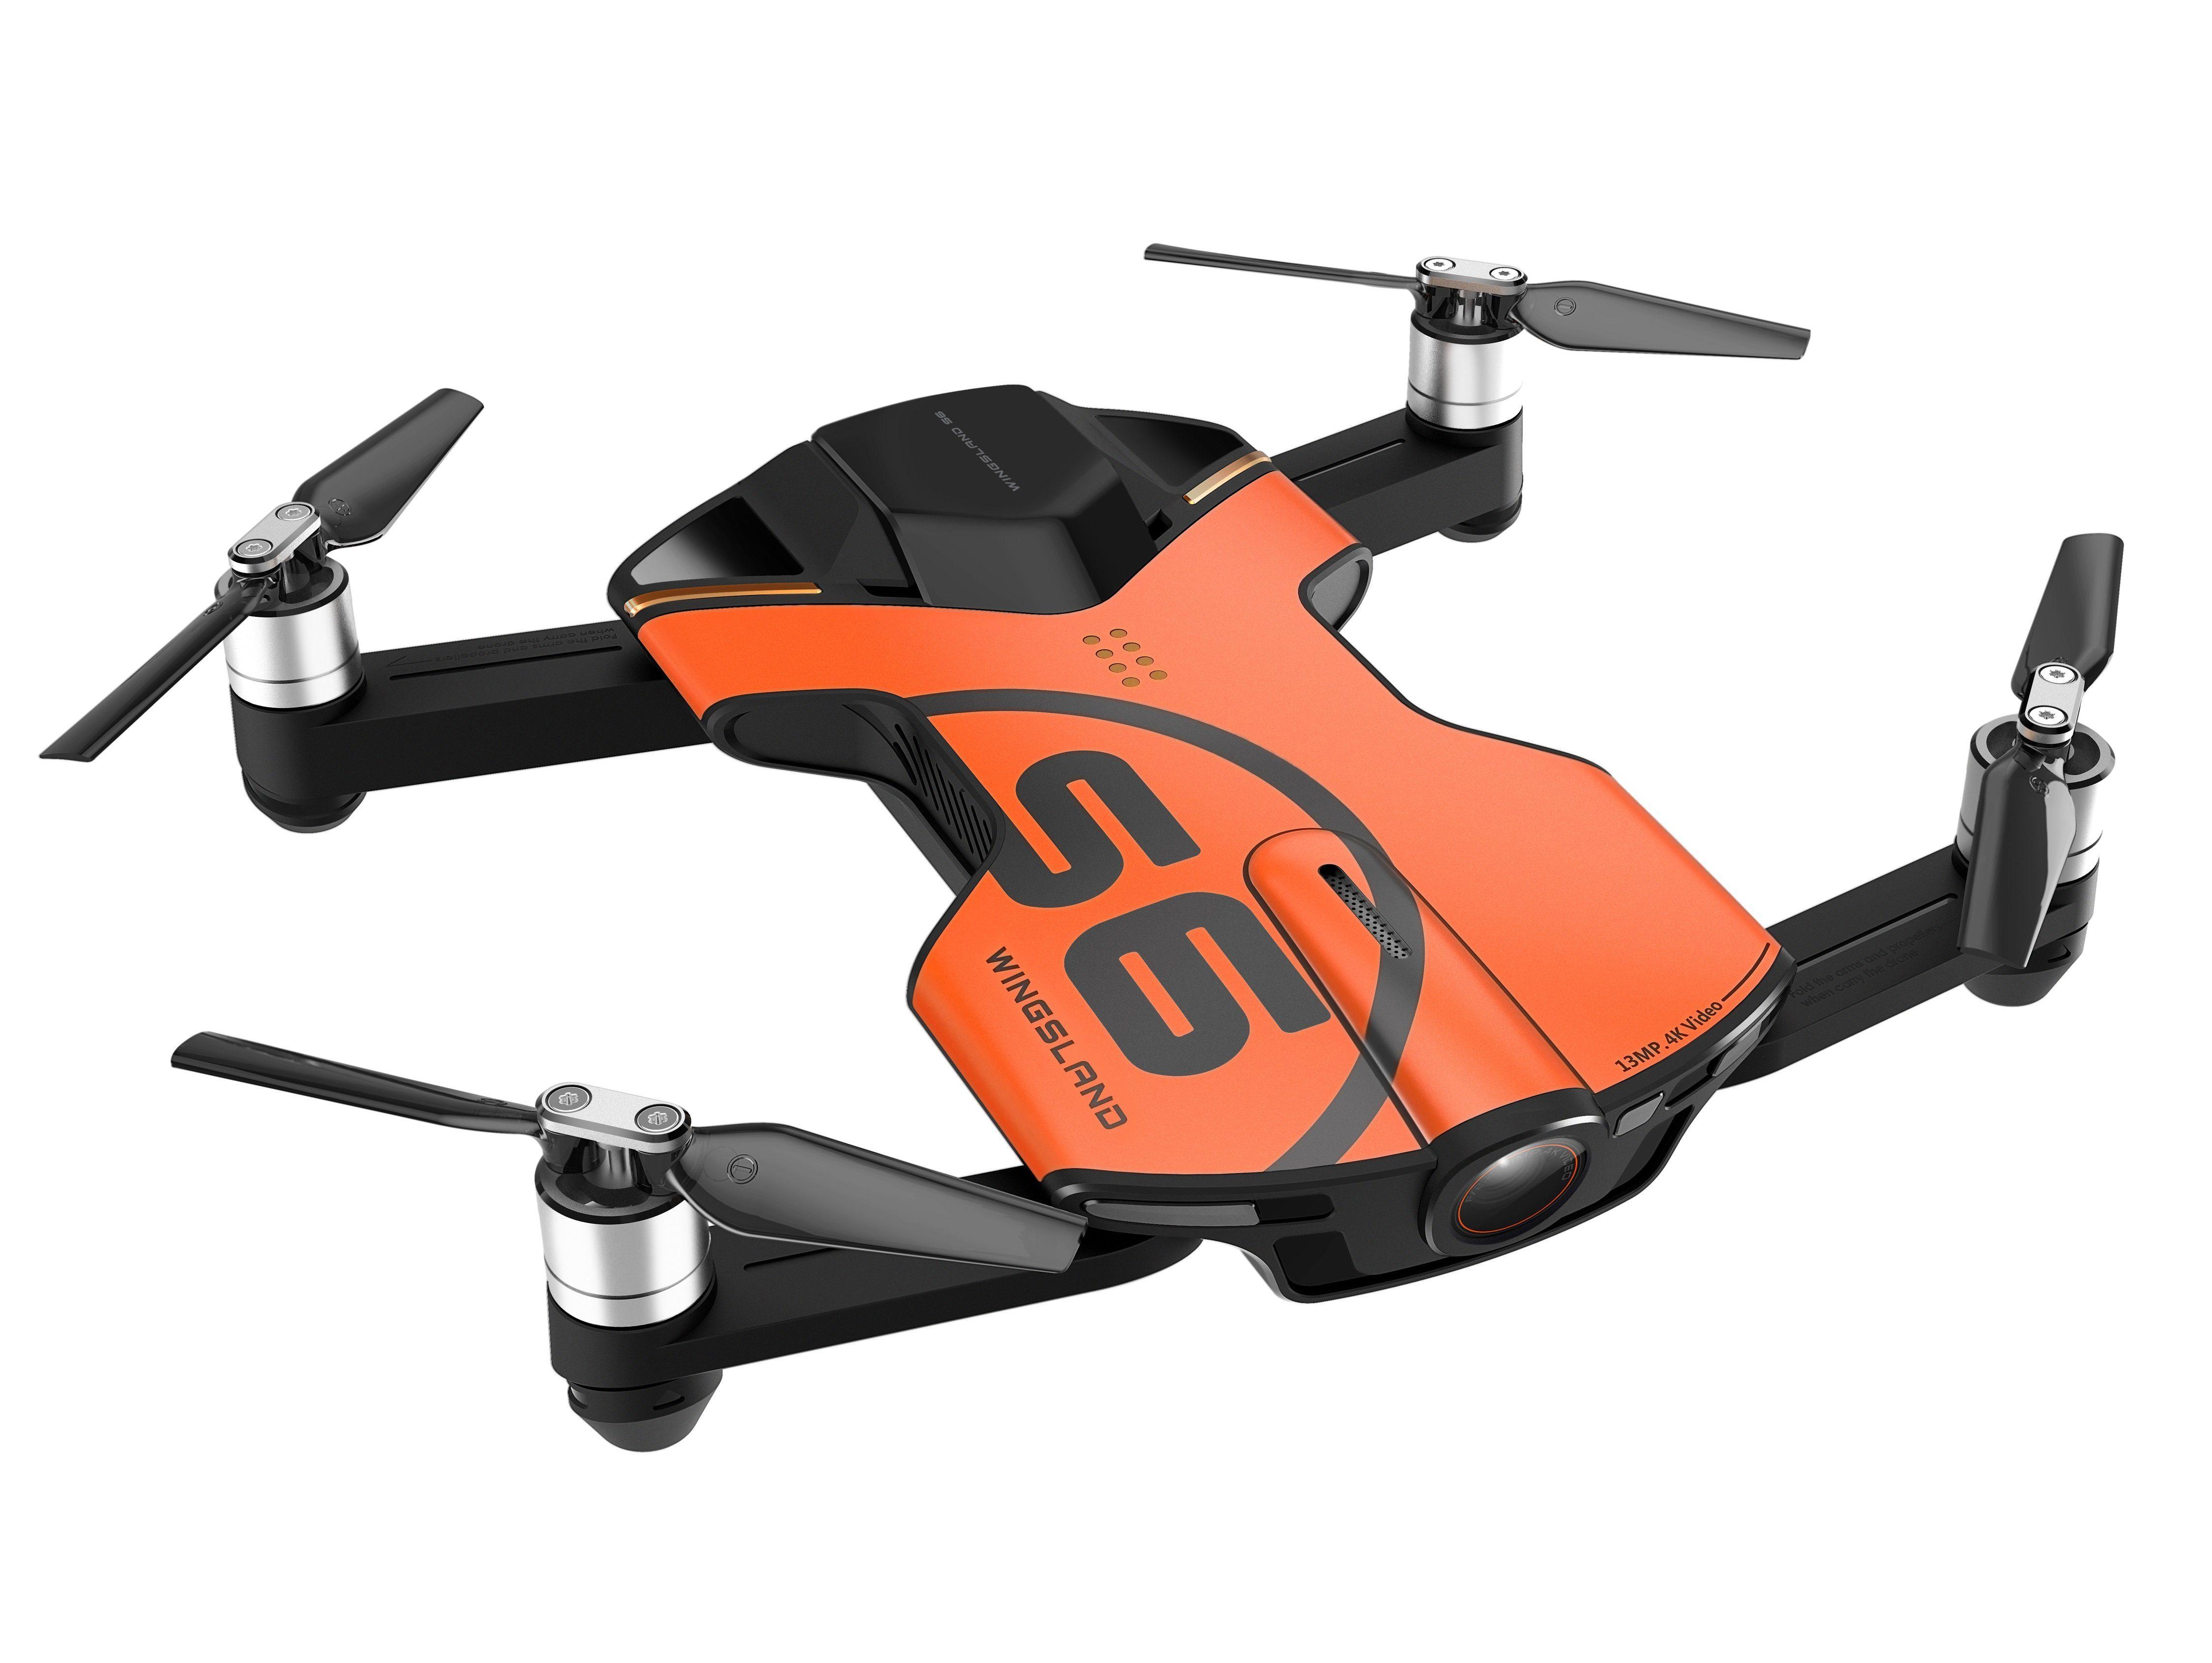 Wingsland Premium Pocket Drohne / Quadrokopter mit 4K Kamera & WiFi »Wingsland S6«